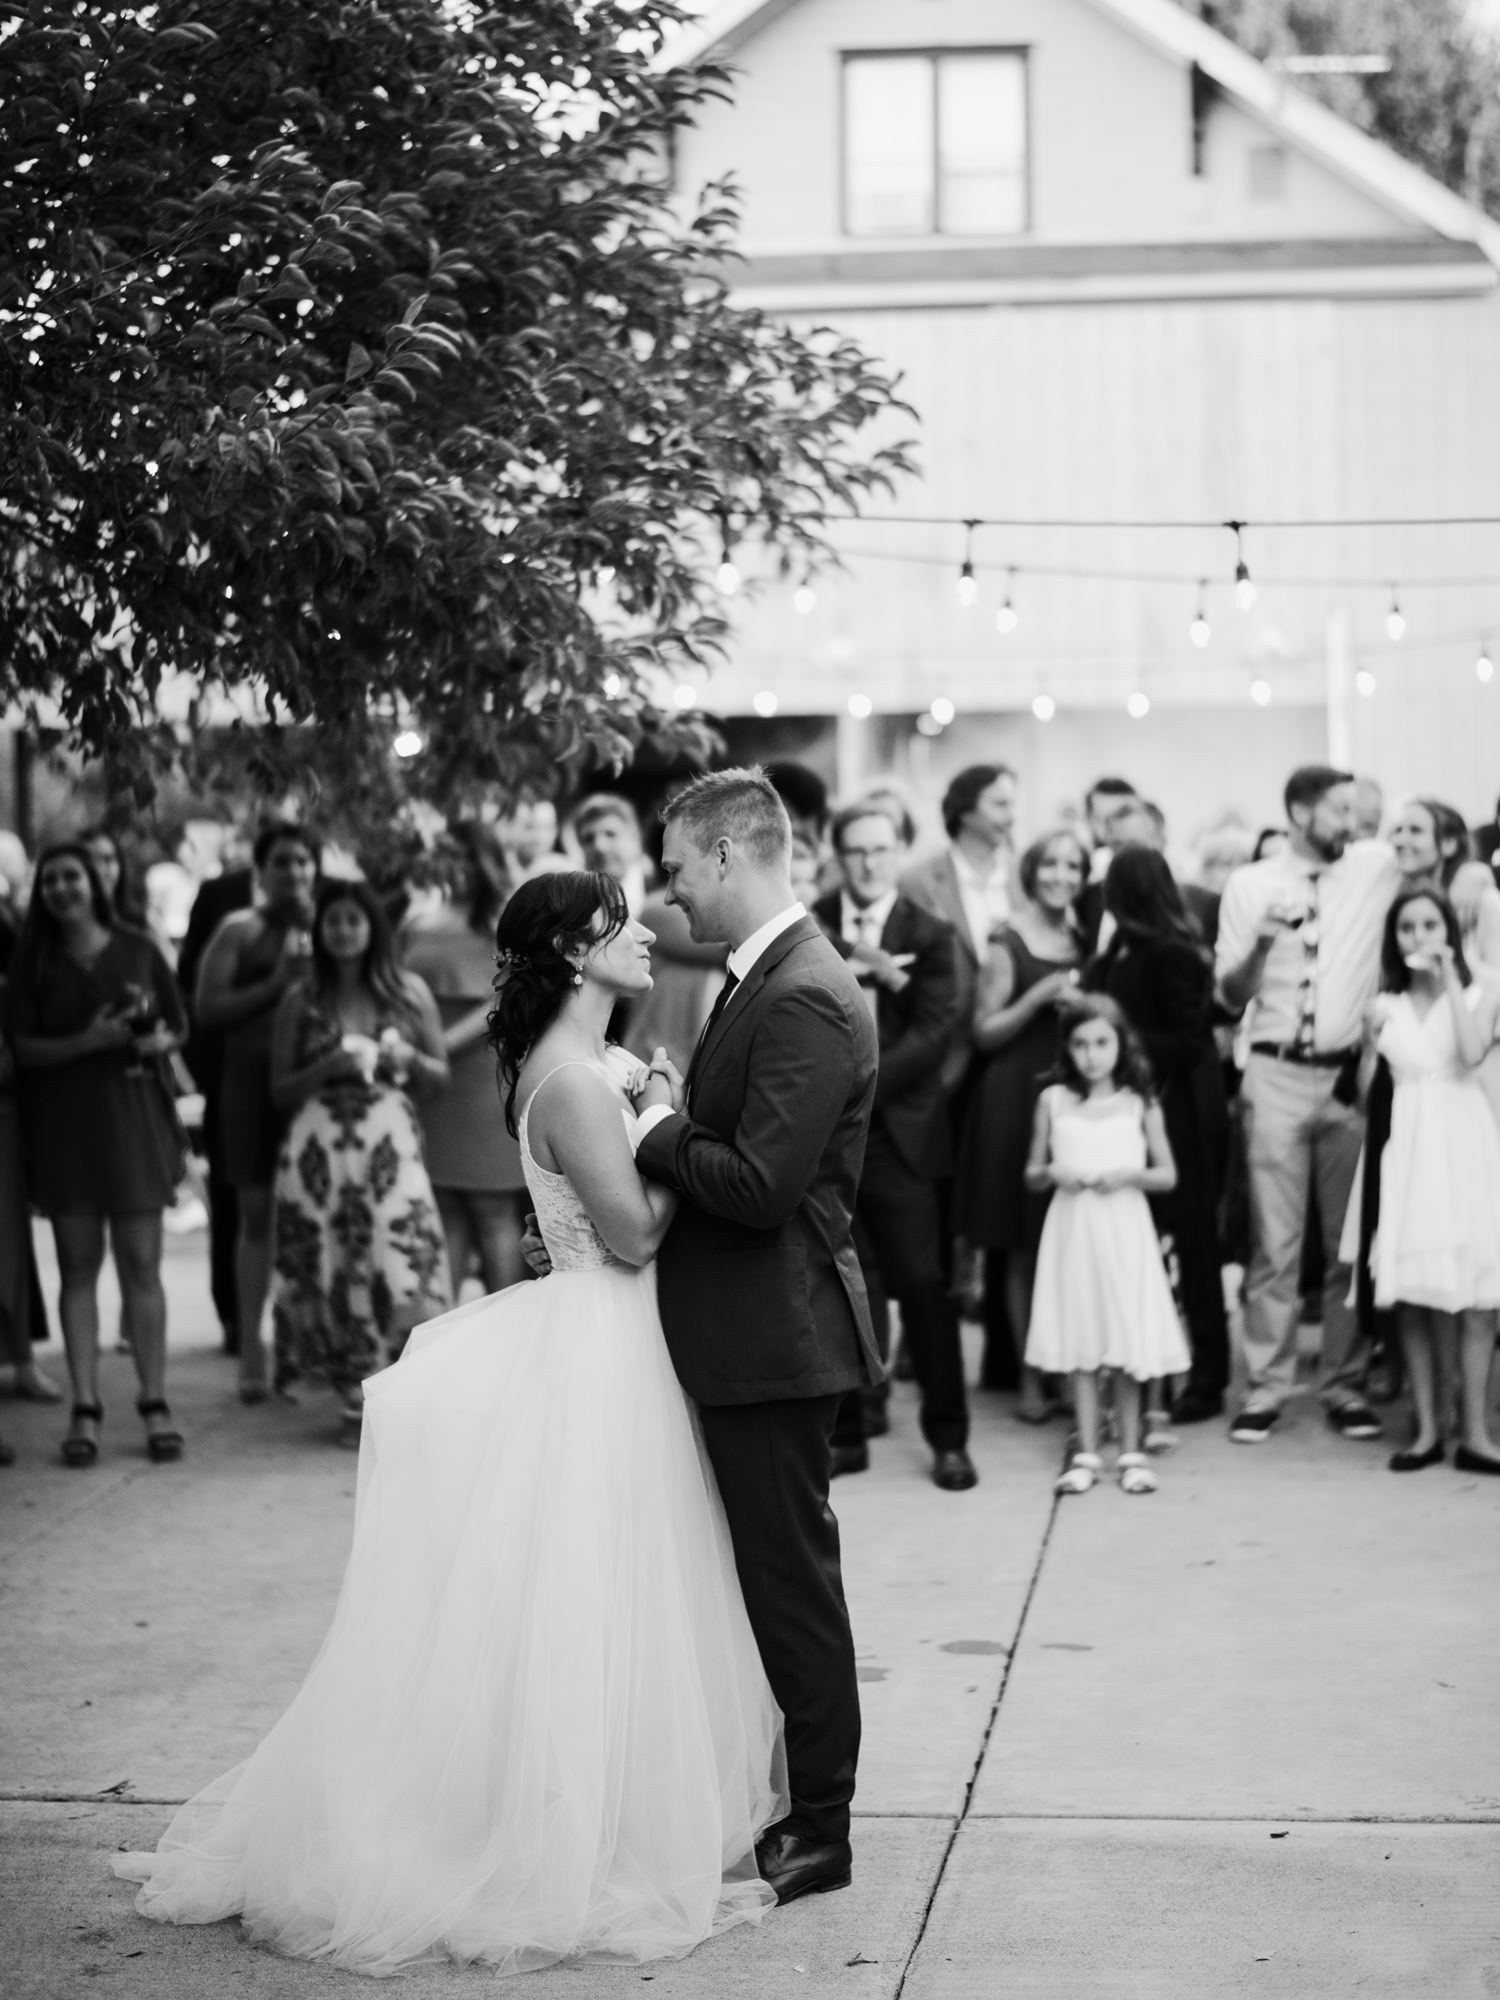 217-woodland-farm-meadow-wedding-by-best-seattle-film-photographer.jpg